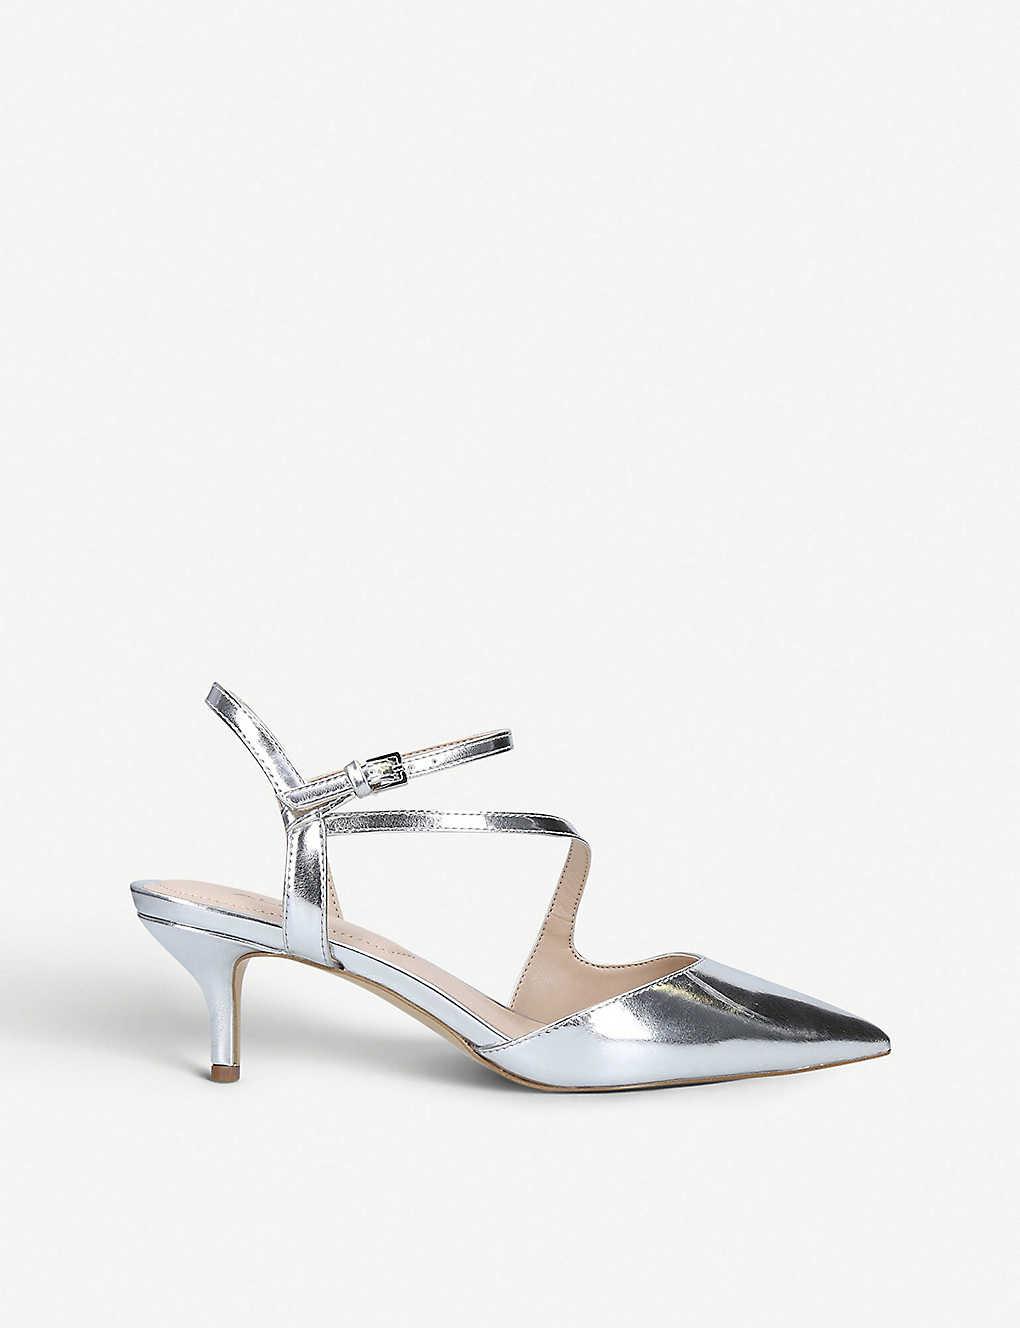 2ddb9c7e96d Caderivia metallic faux-leather kitten heel courts - Silver ...